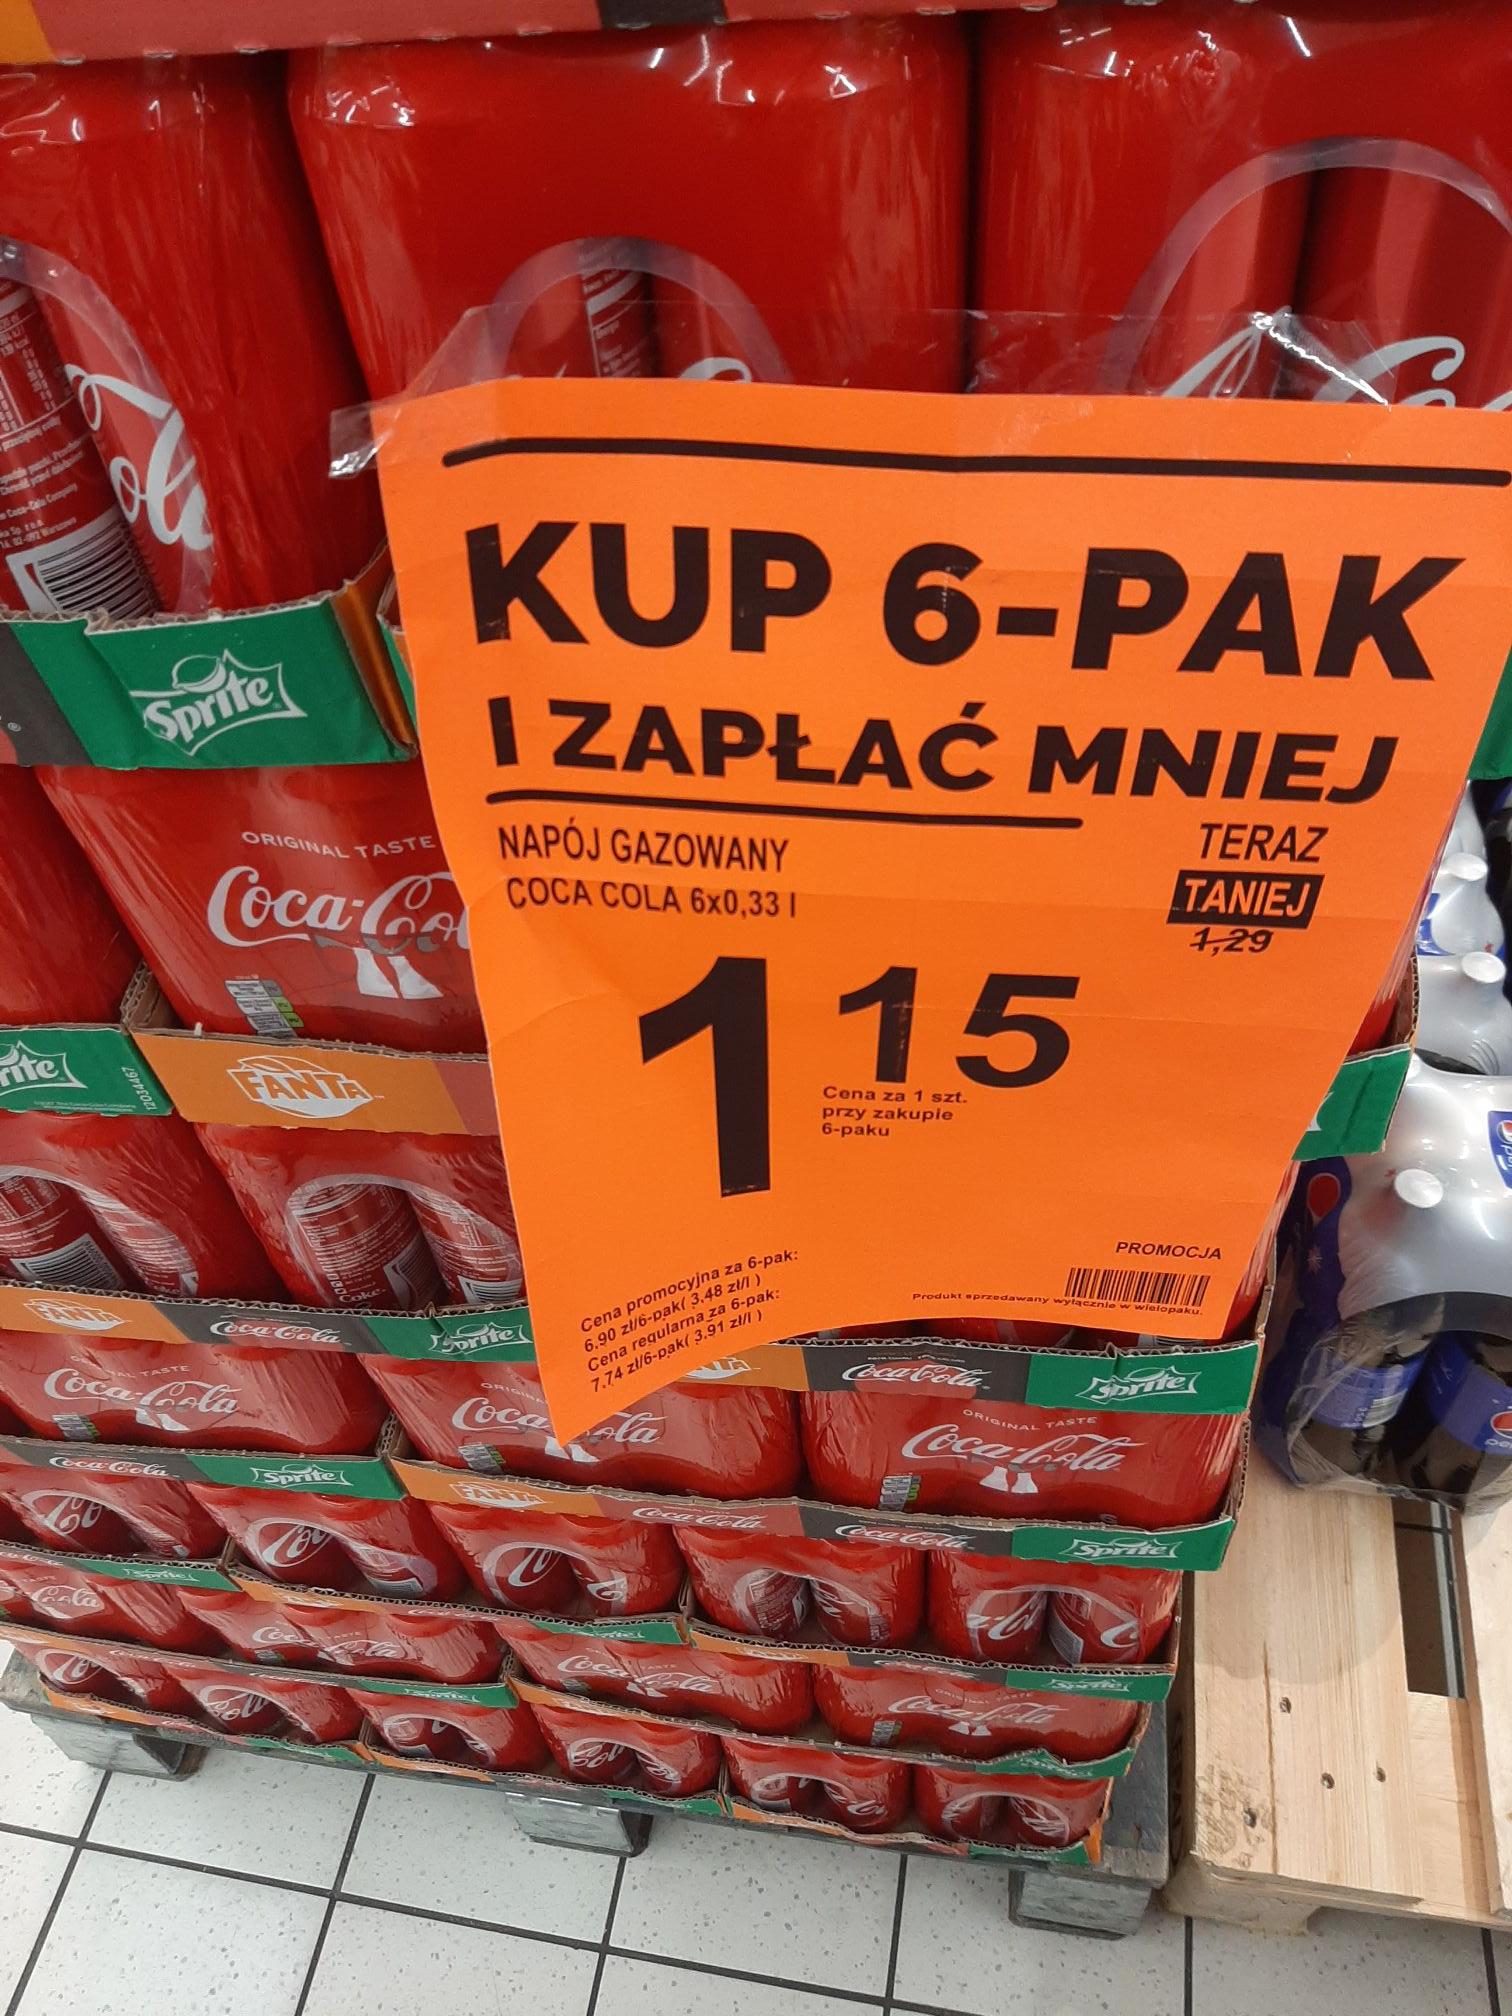 6-pak Coca-Cola 1,15 zł/330 ml - Biedronka